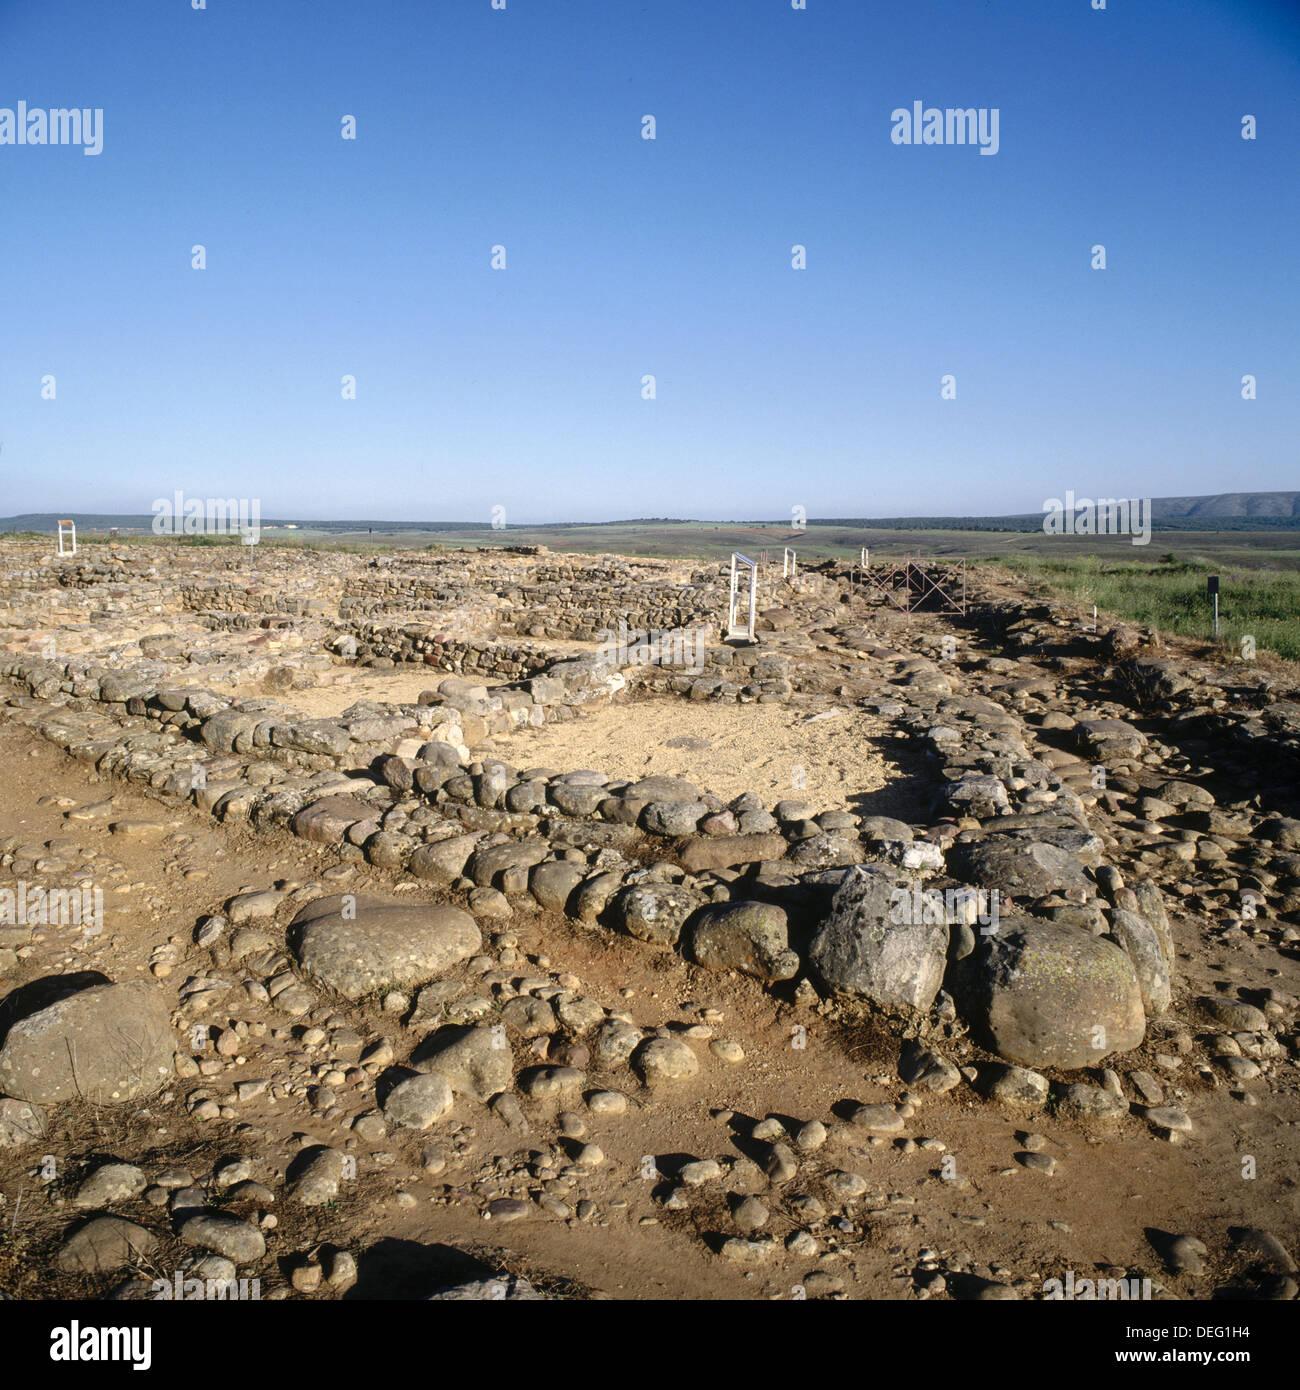 Ruins of of the town of Numancia (Numantia) near Garray. Soria province, Castilla-León, Spain - Stock Image